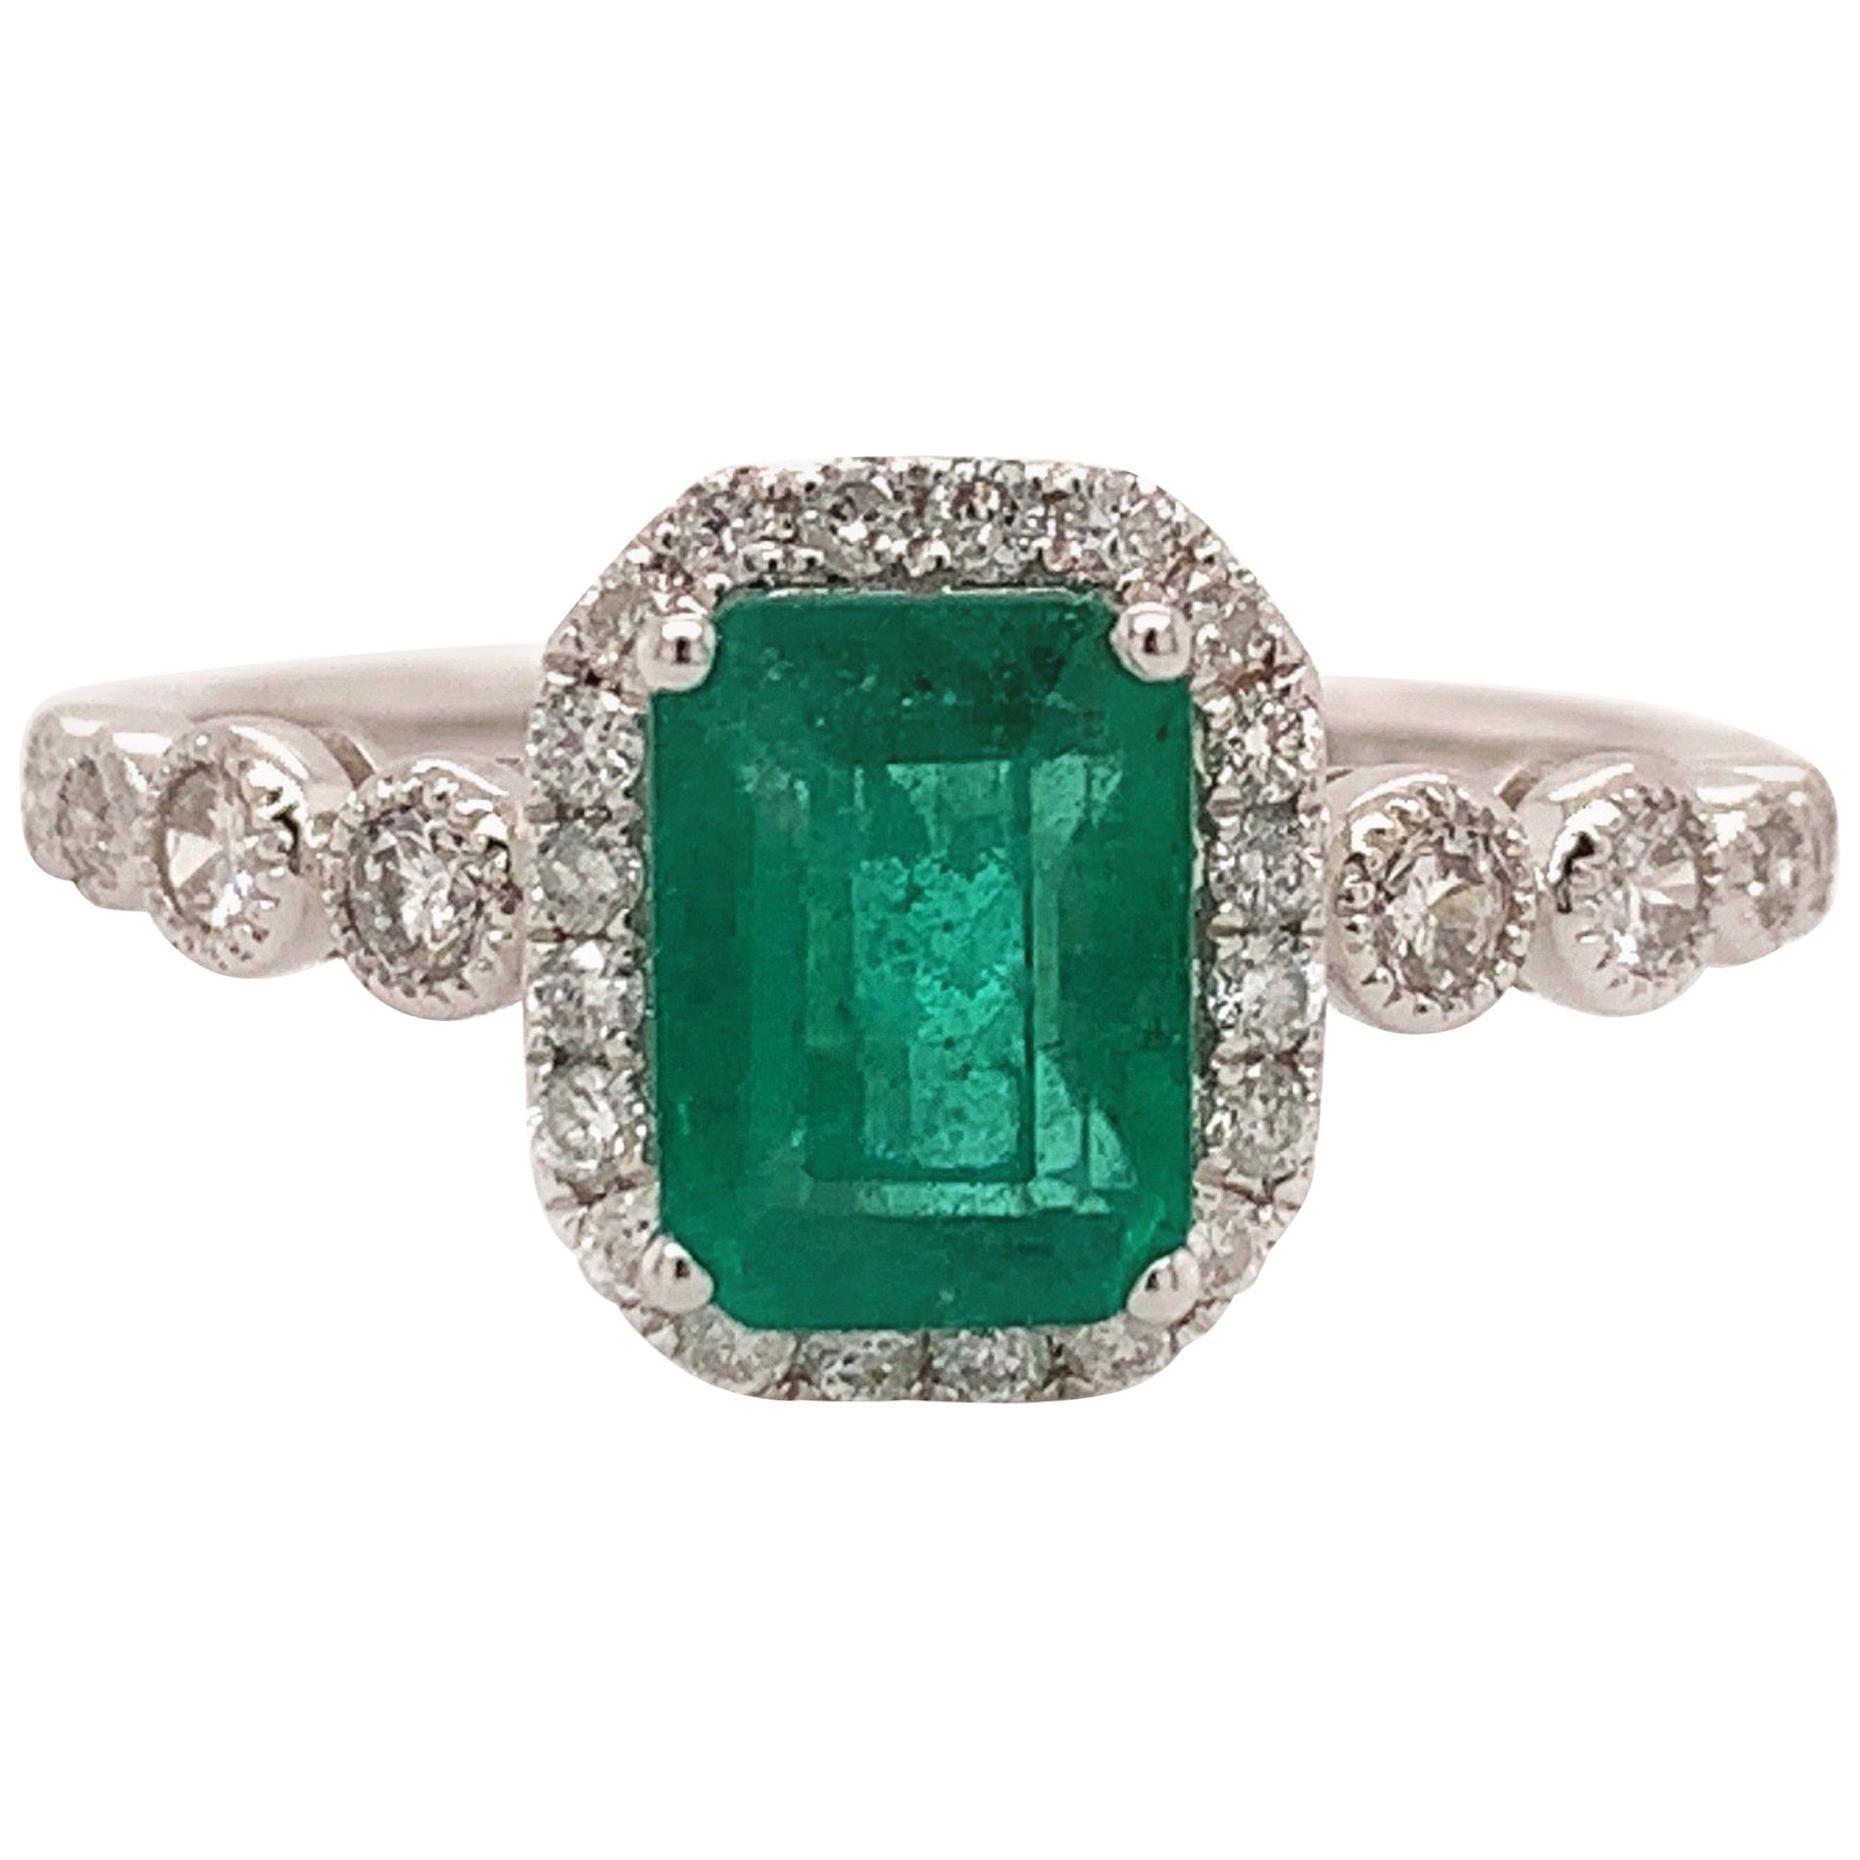 1.10 Carat Emerald White Gold Cocktail Ring